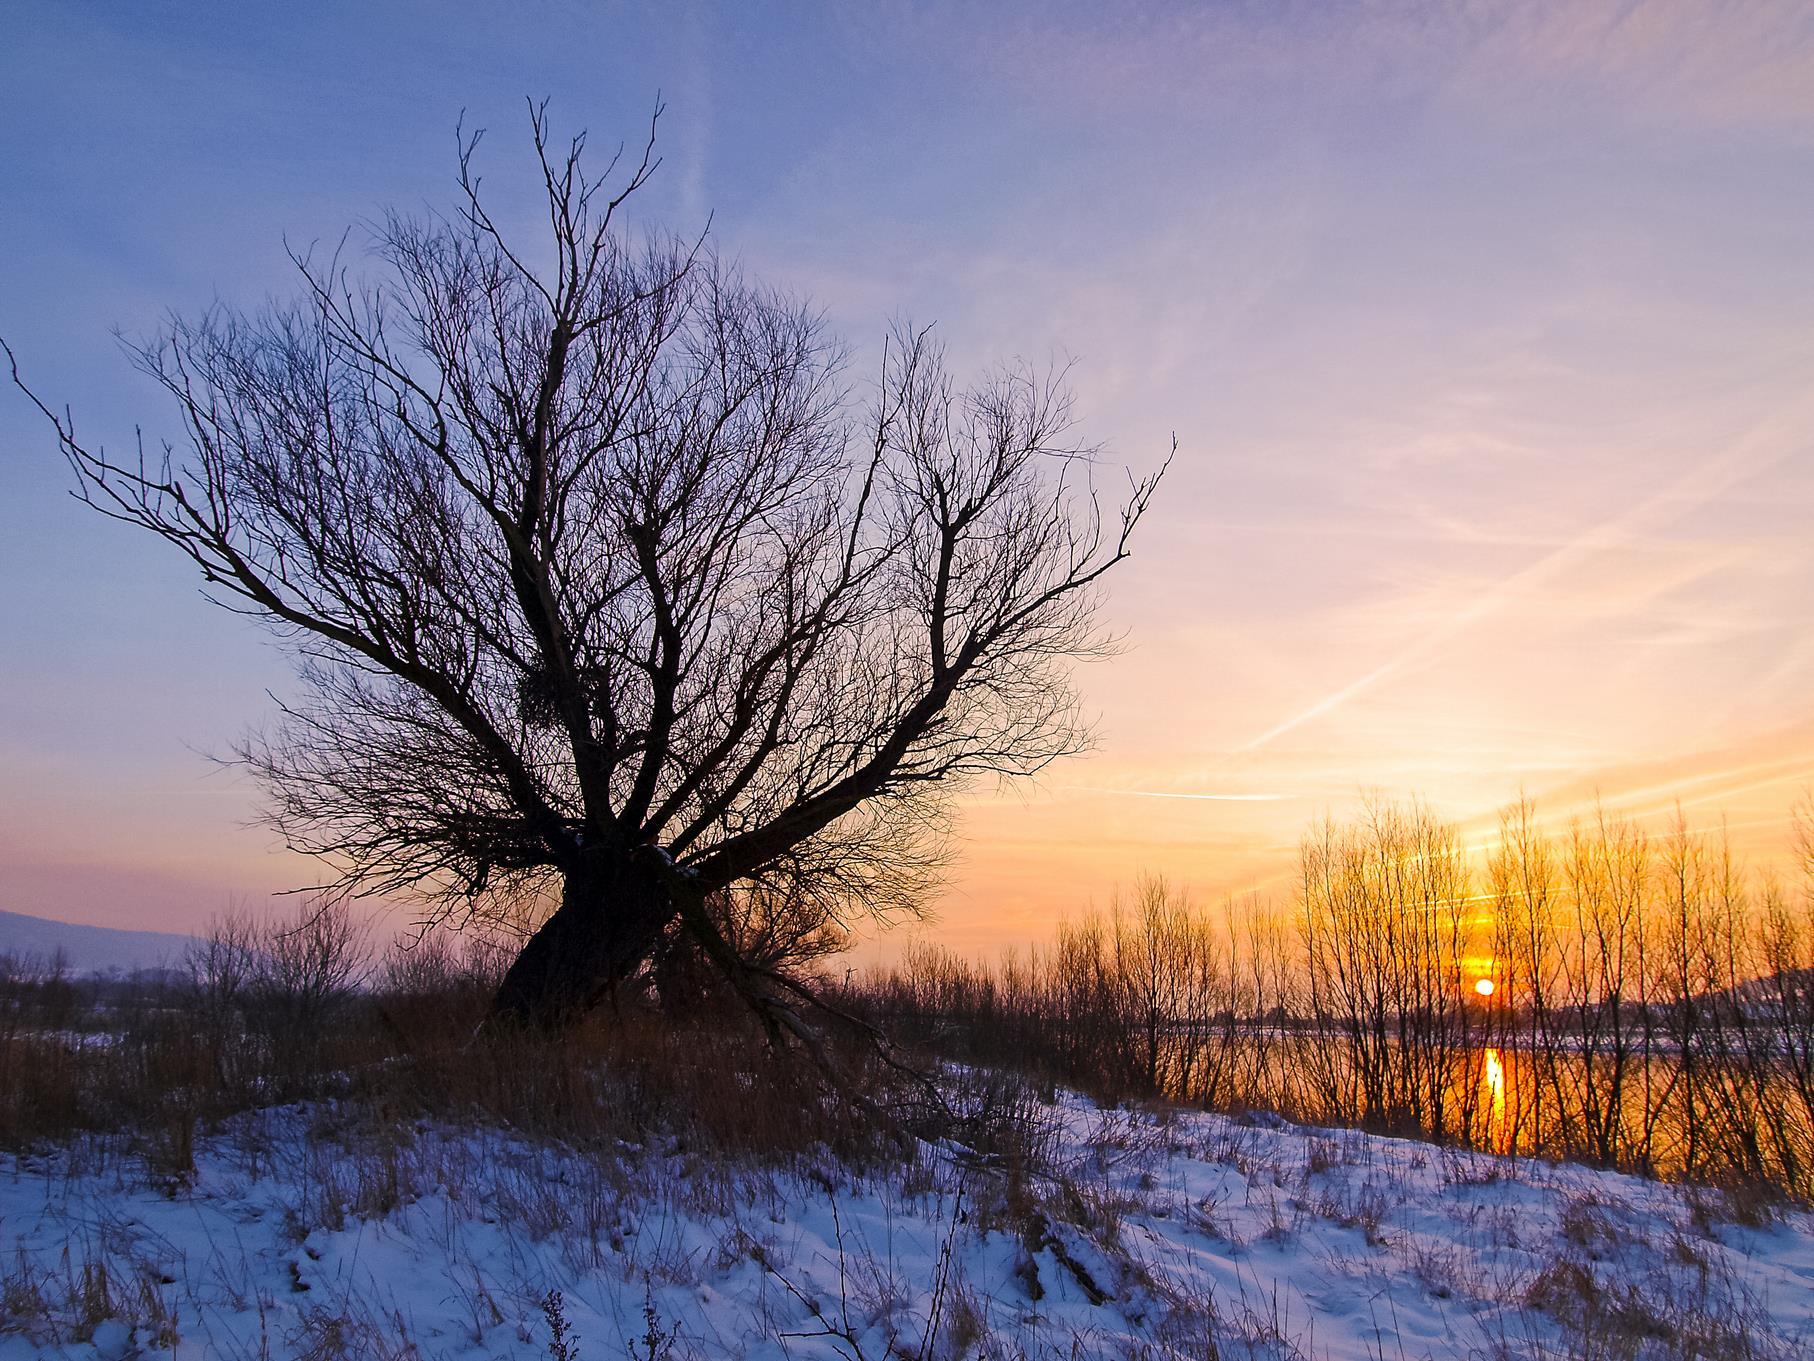 Kopfweide in der Auenlandschaft bei Sonnenaufgang.